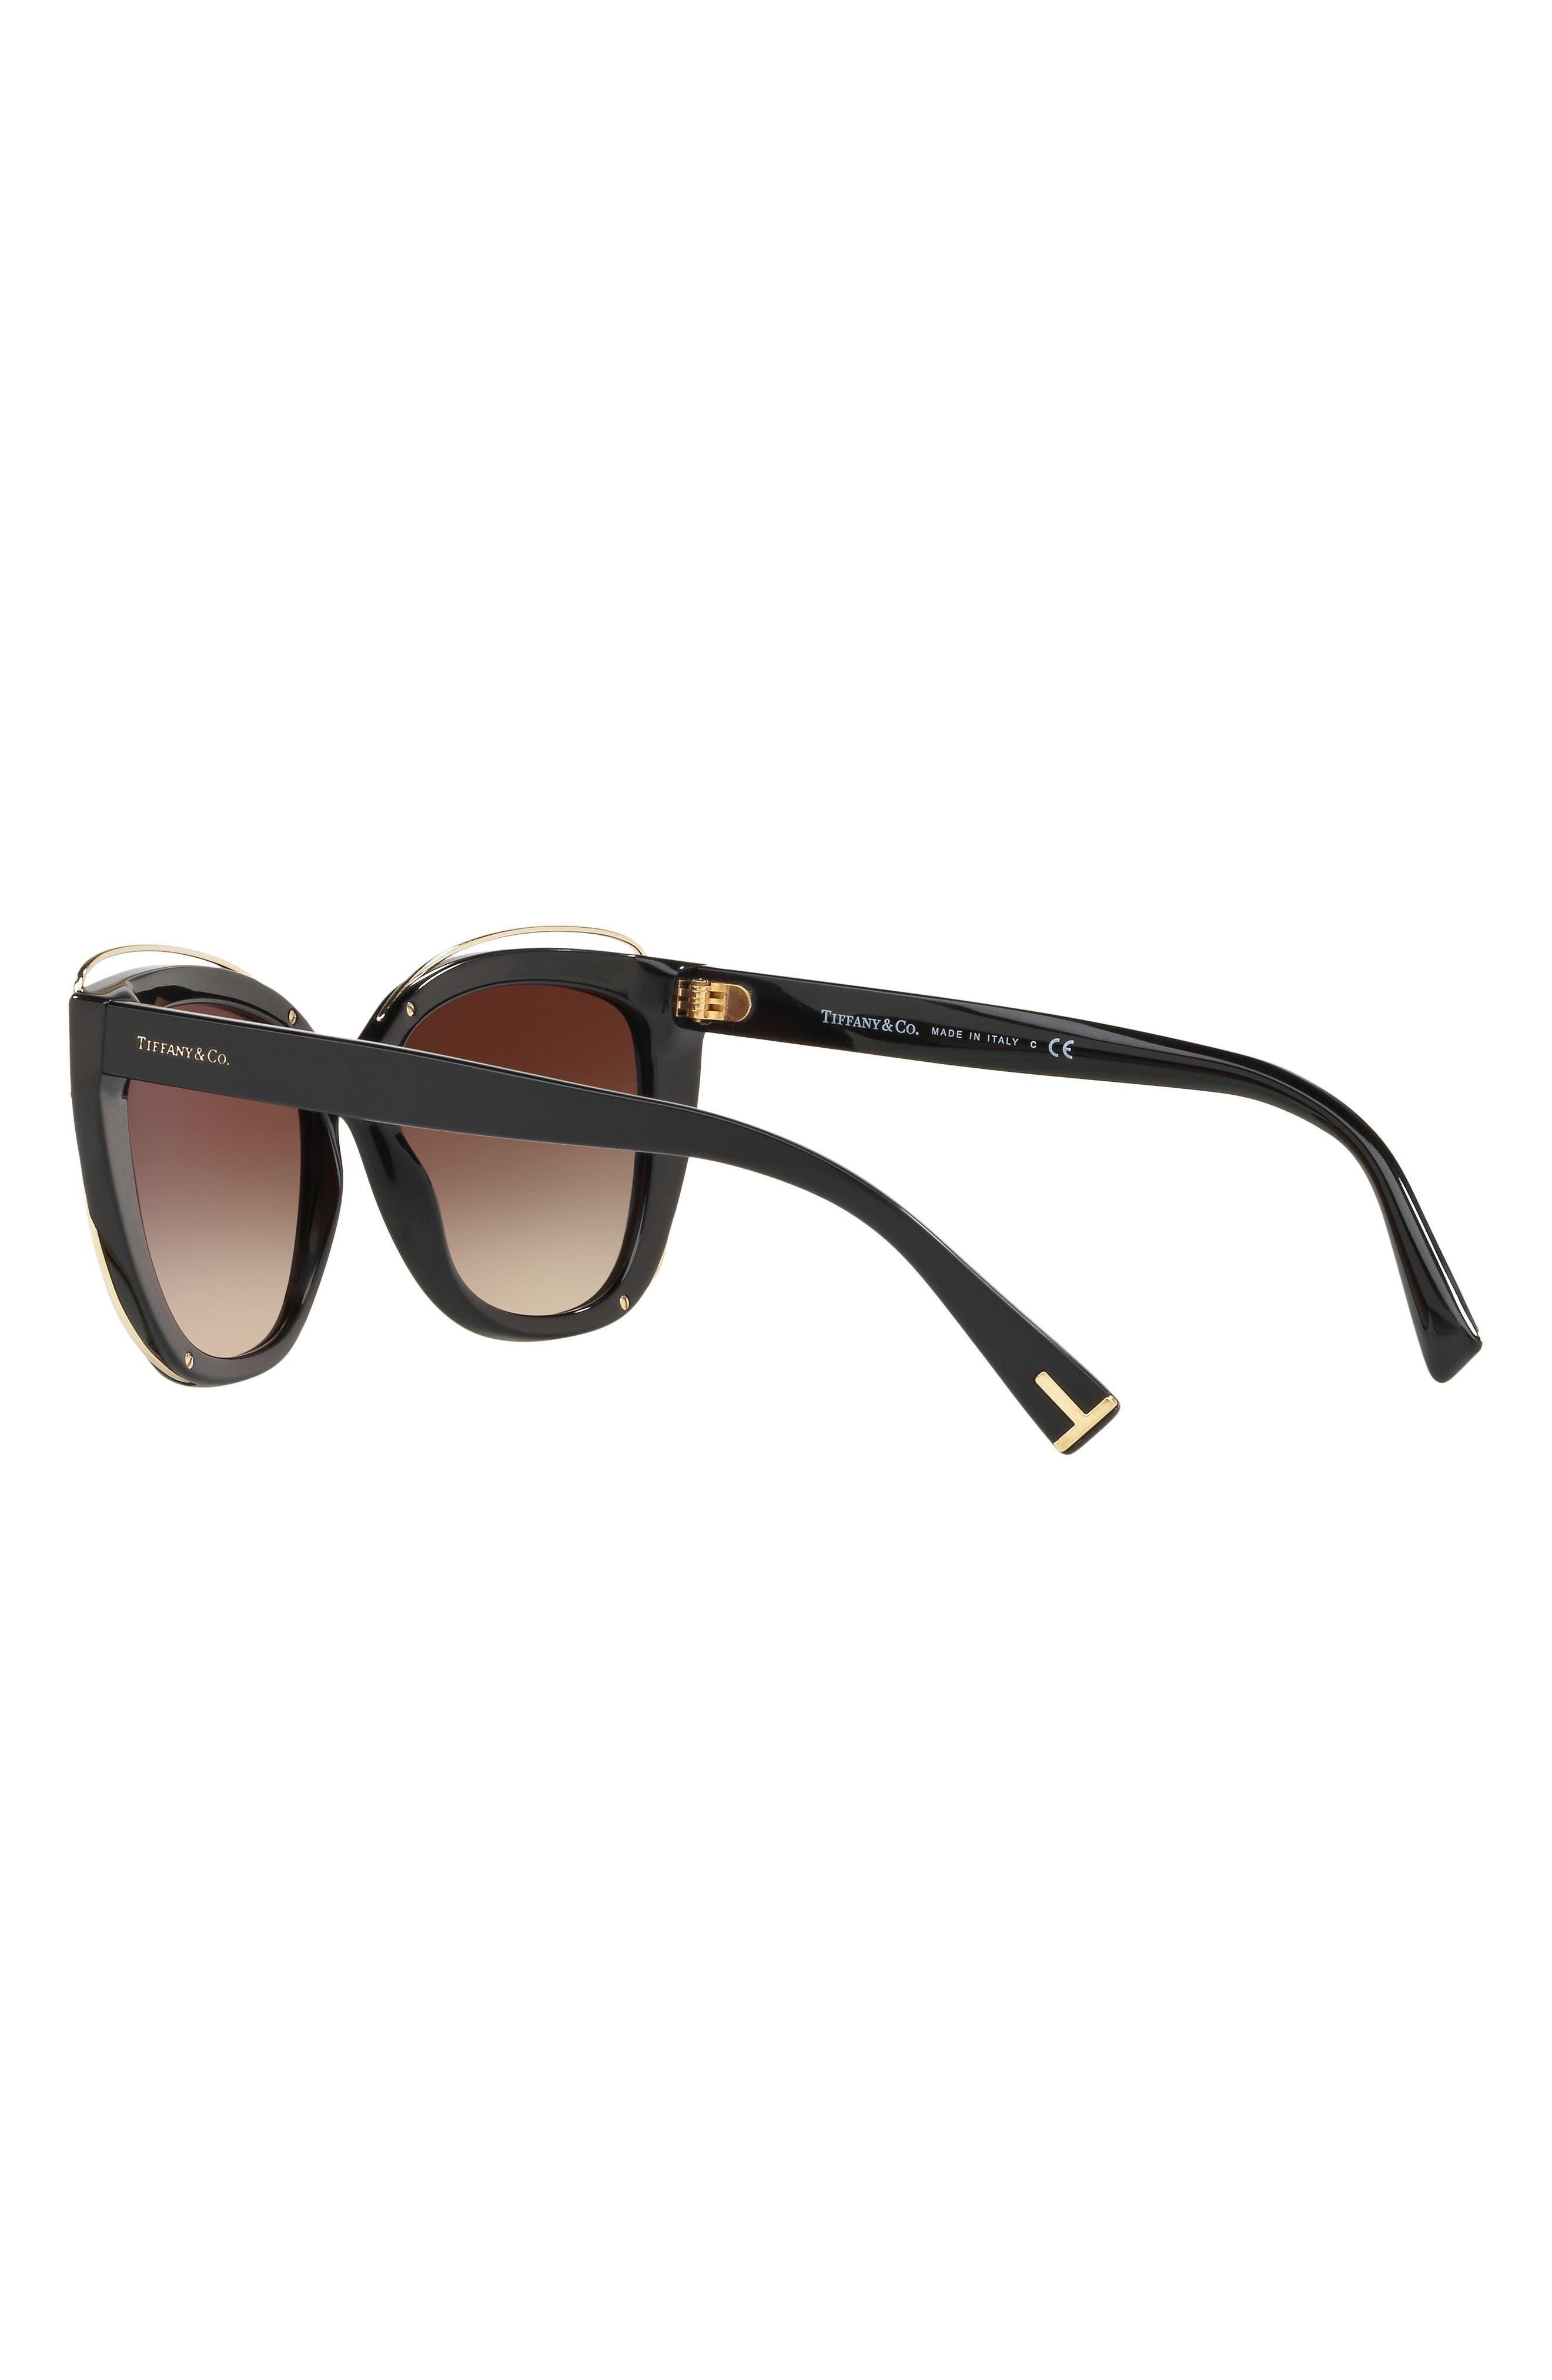 54mm Gradient Cat Eye Sunglasses,                             Alternate thumbnail 2, color,                             BLACK GRADIENT